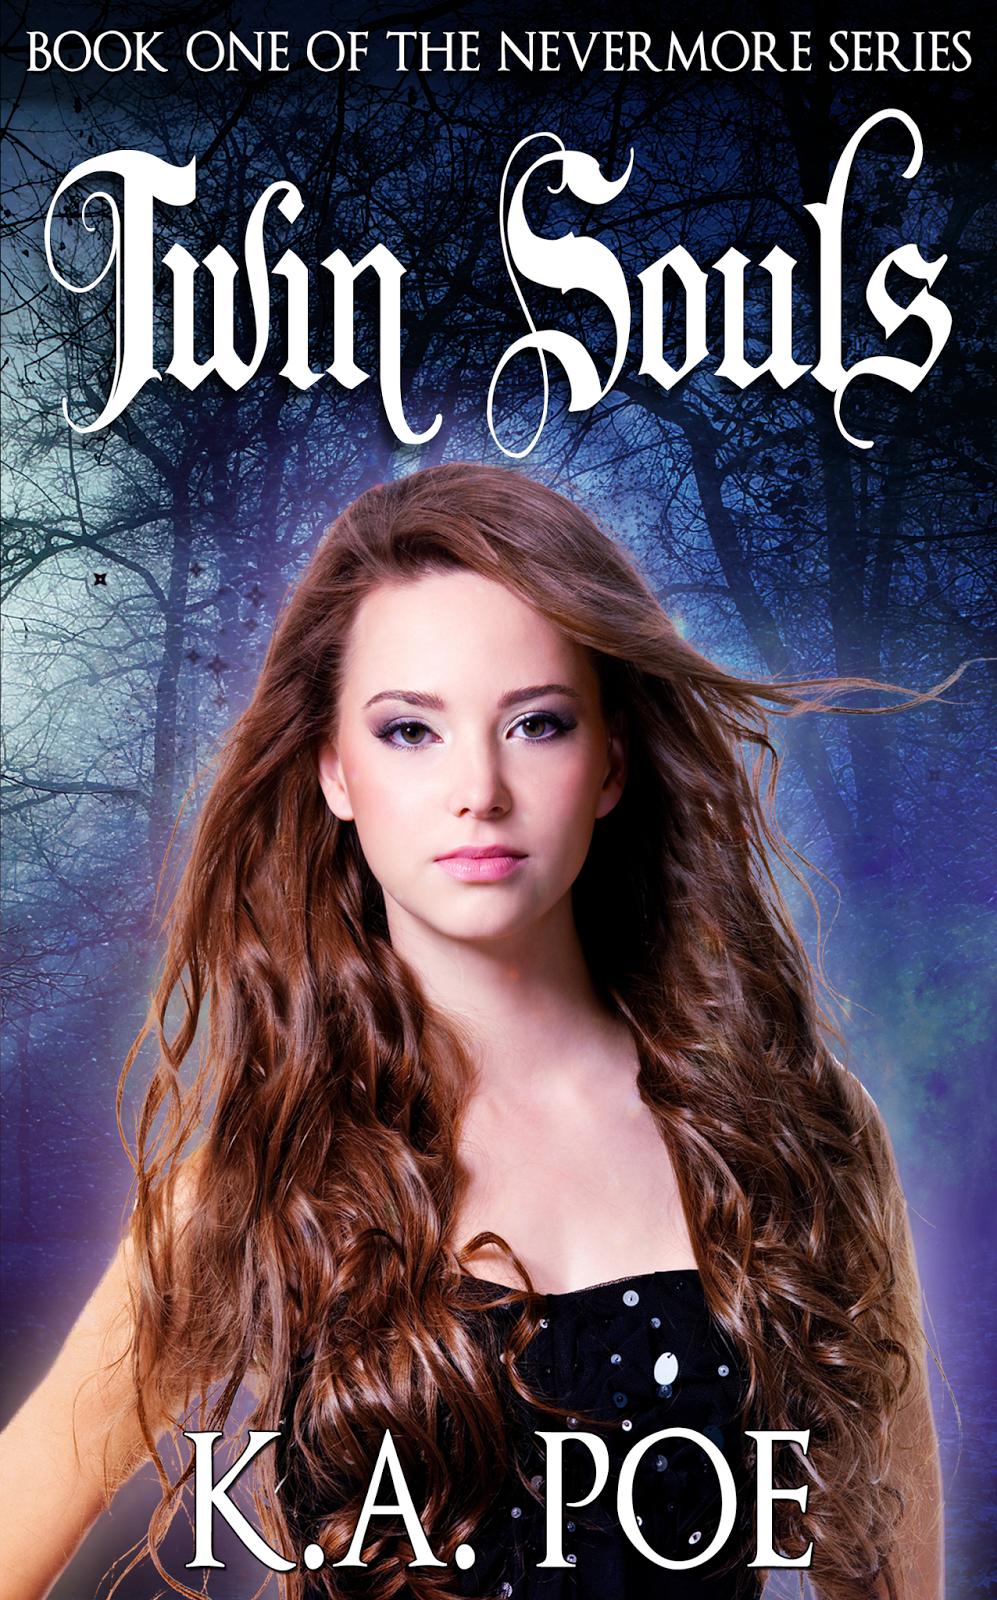 http://www.amazon.com/Twin-Souls-Nevermore-Book-Vampire-ebook/dp/B007Q4JDEM/ref=sr_1_1?s=books&ie=UTF8&qid=1419277378&sr=1-1&keywords=twin+souls